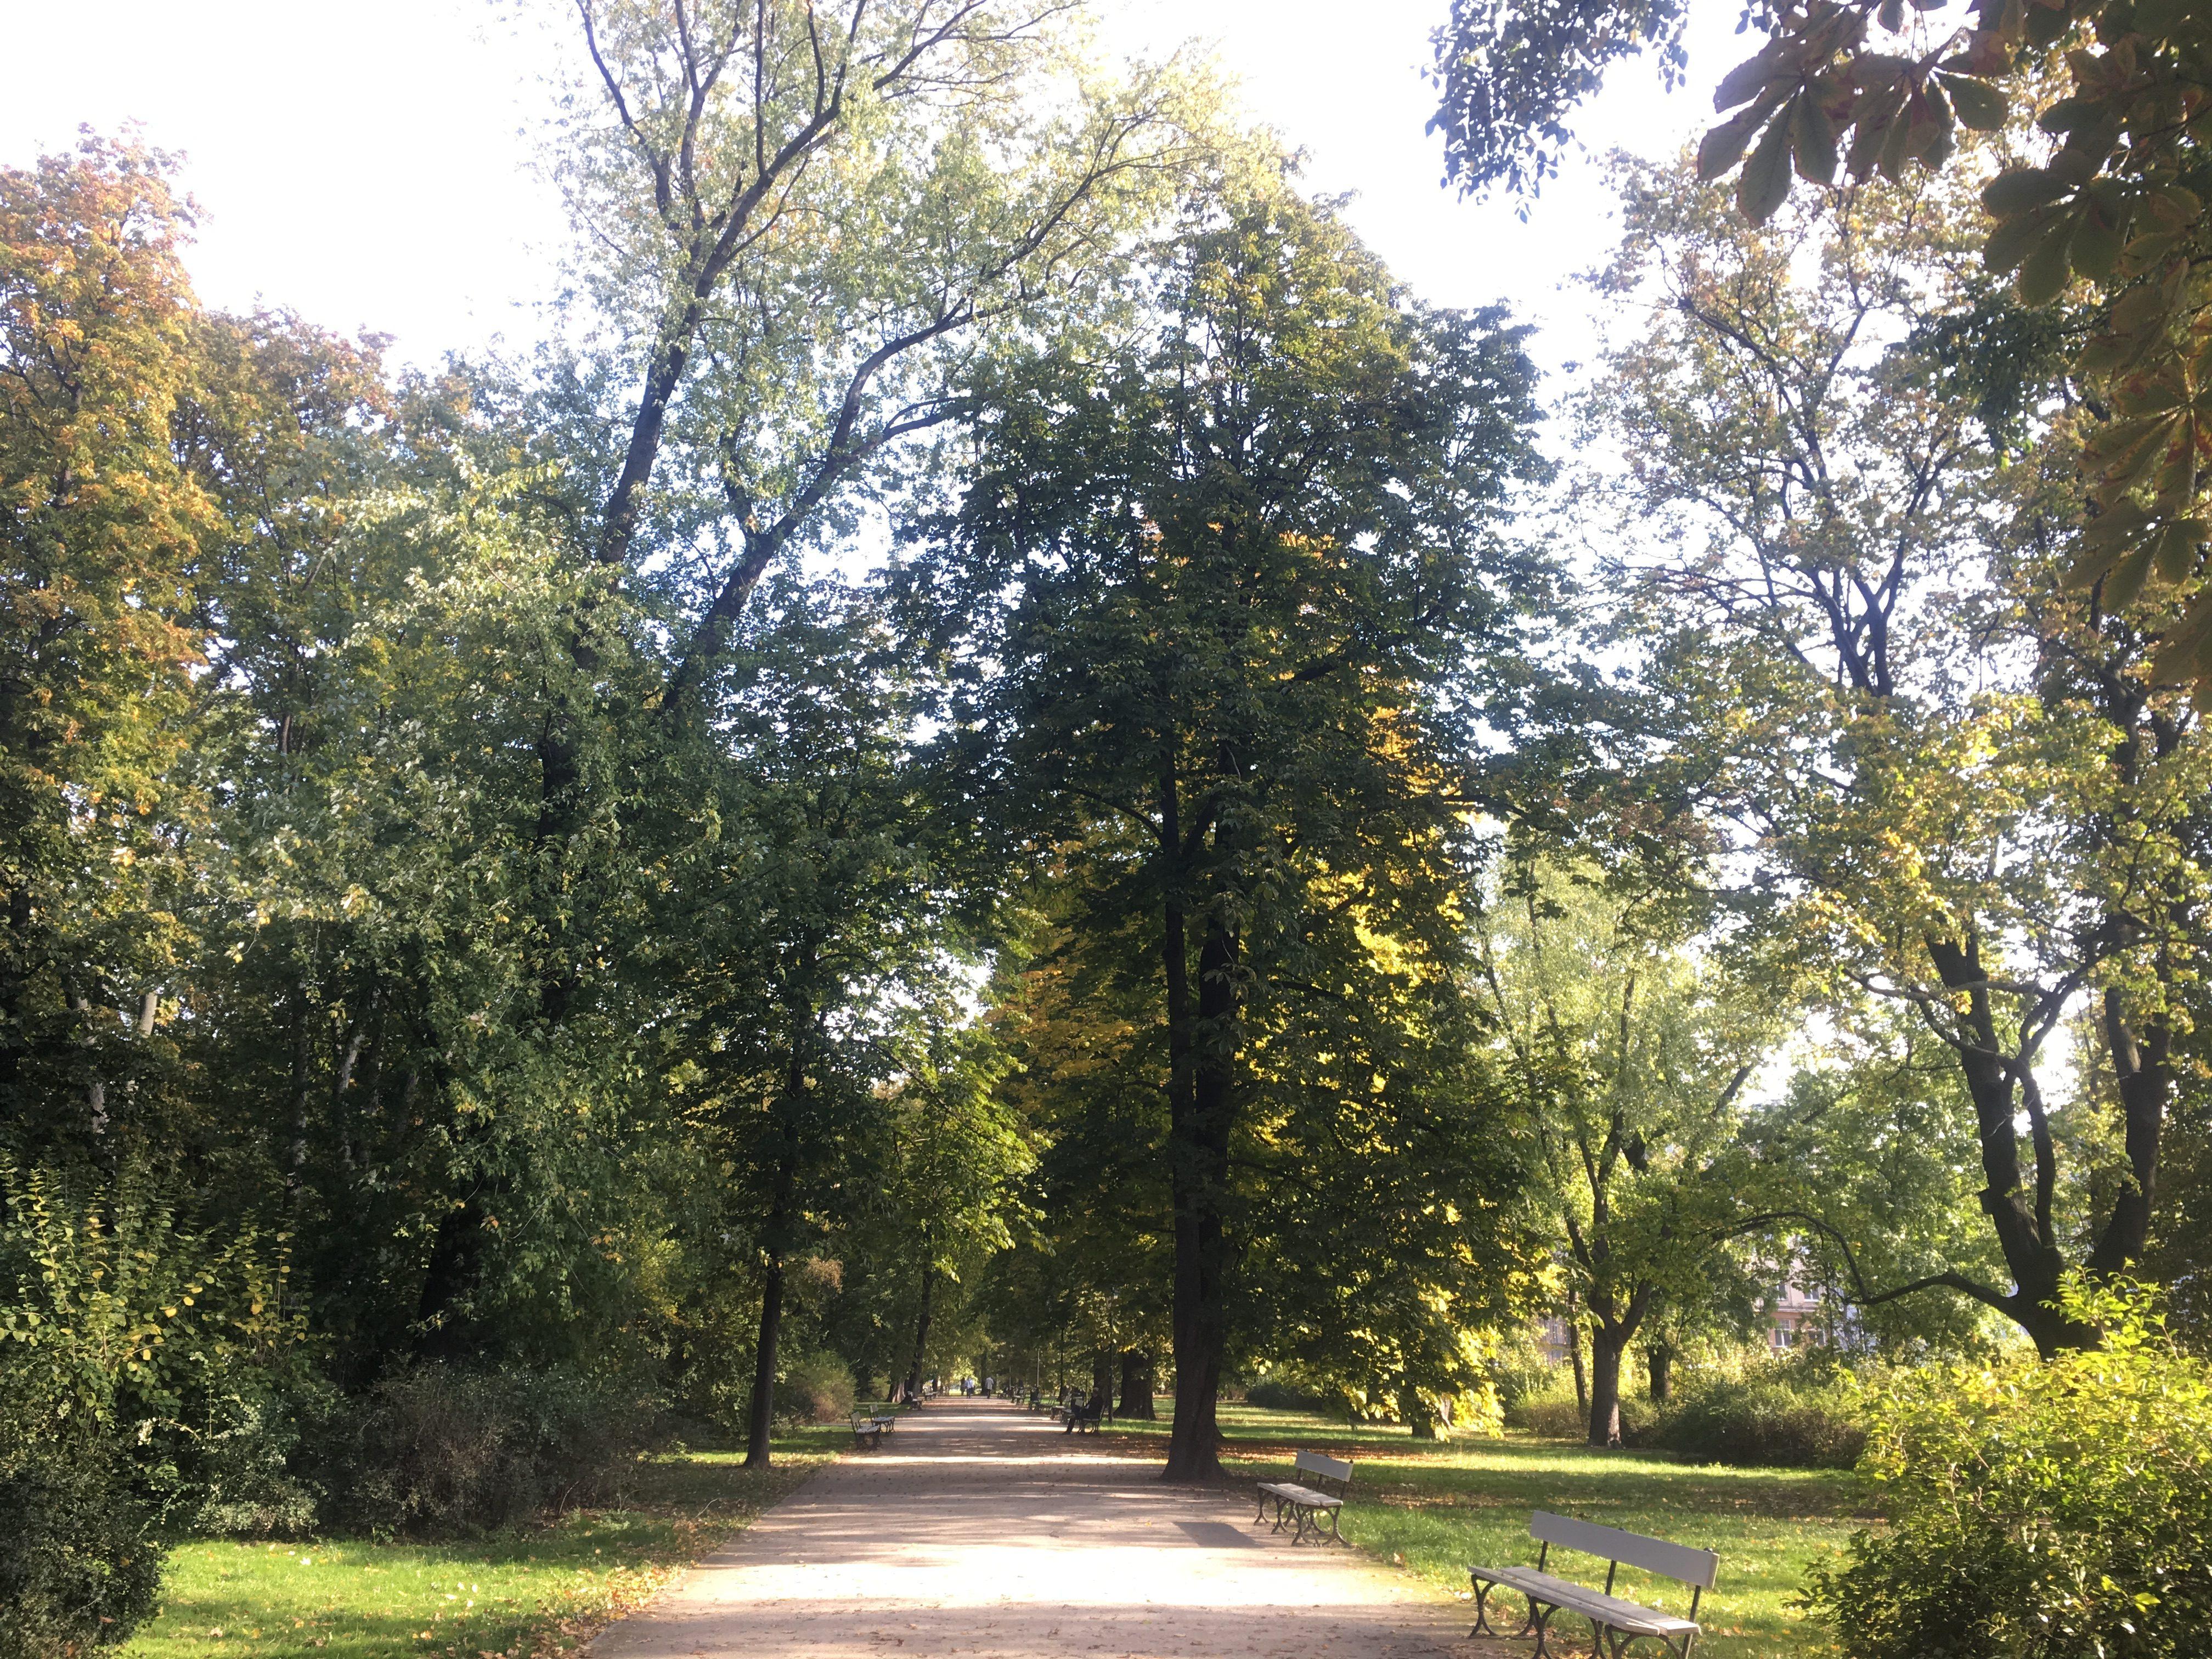 Autumn colour in the Saxony Gardens